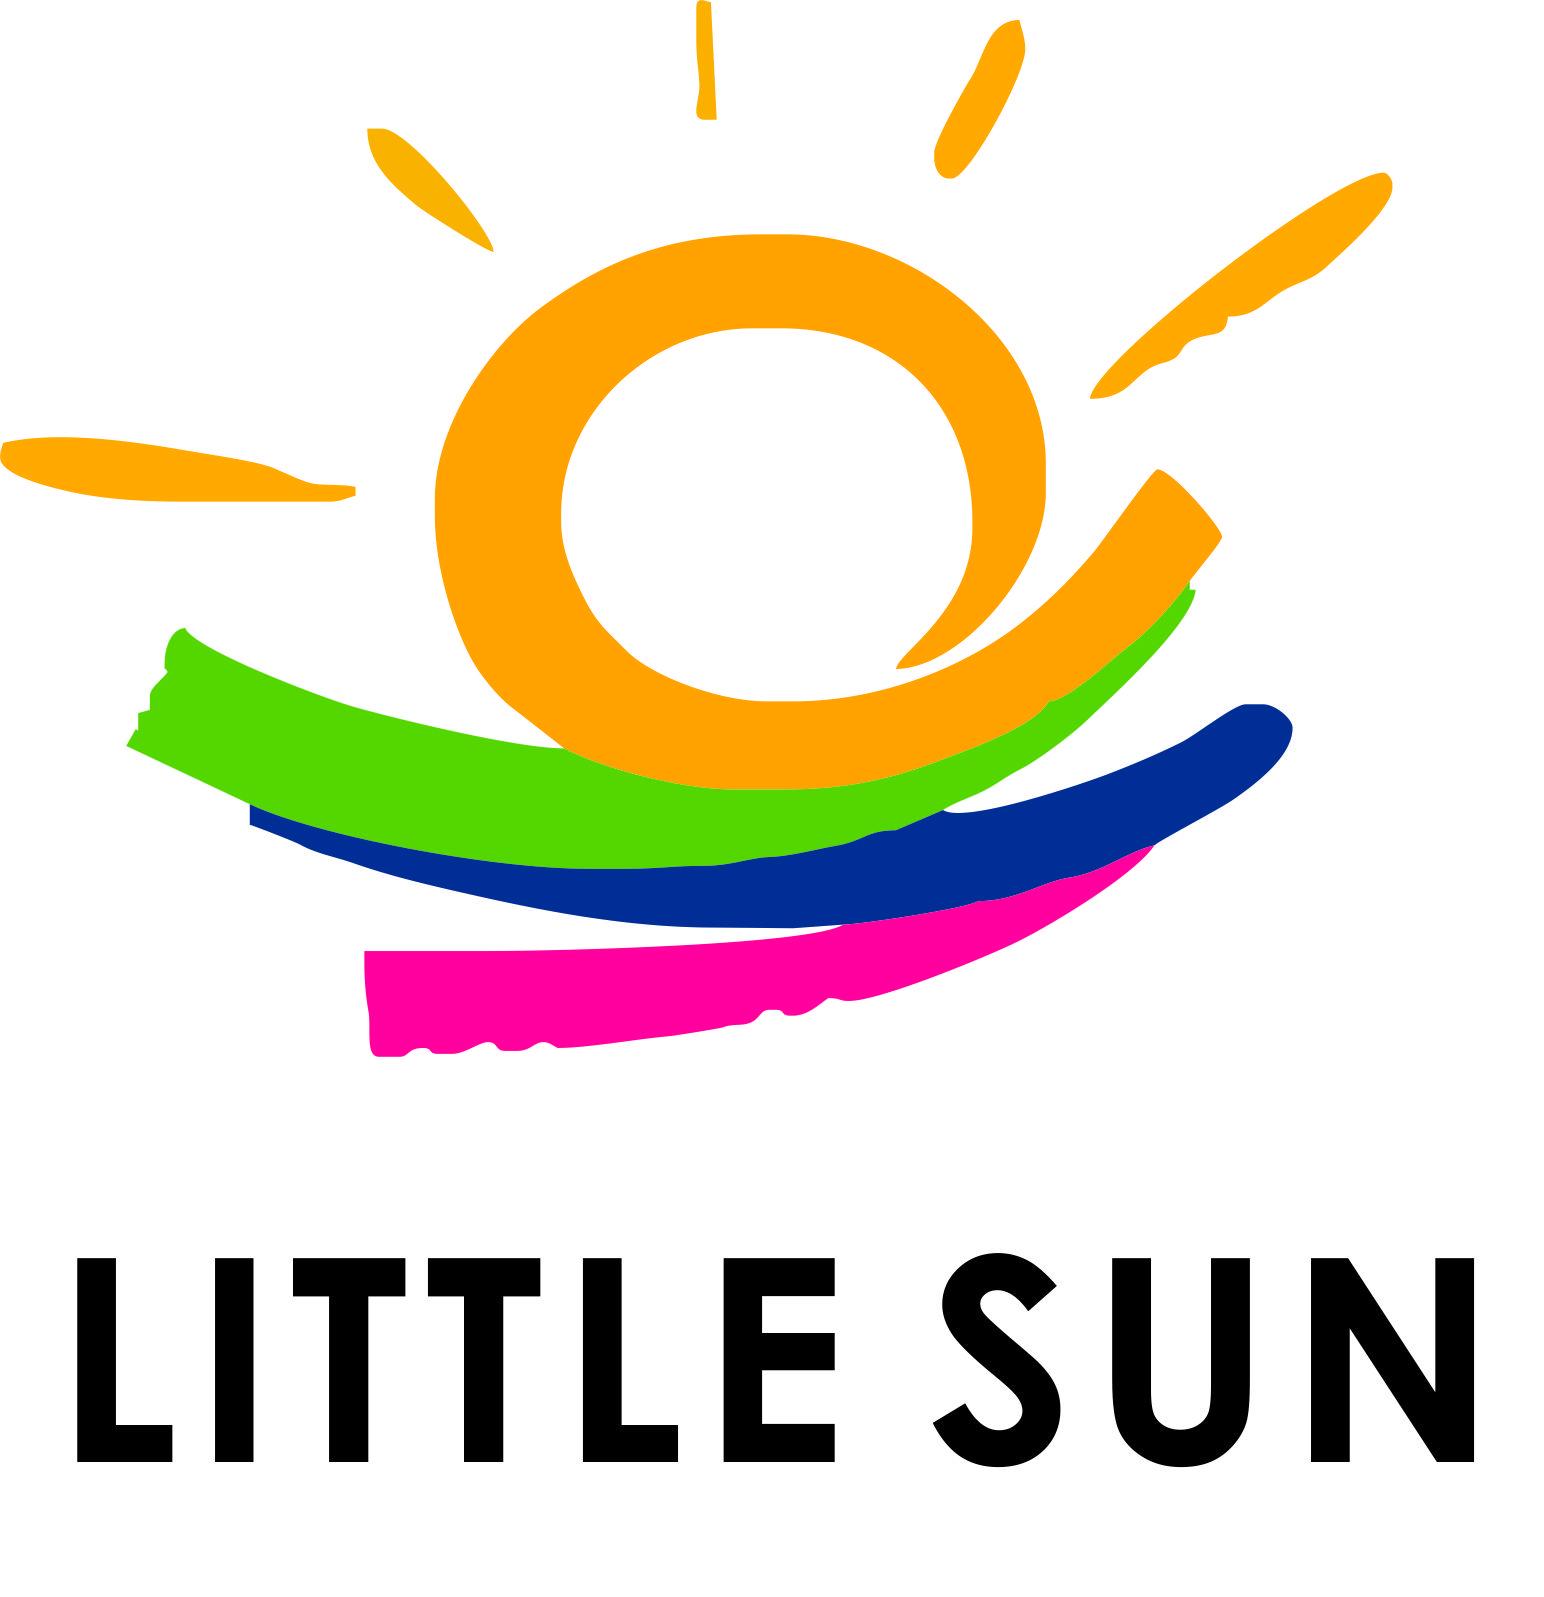 Sun logos images nice wallpaper solstruck logo pinterest sun logos images nice wallpaper buycottarizona Images